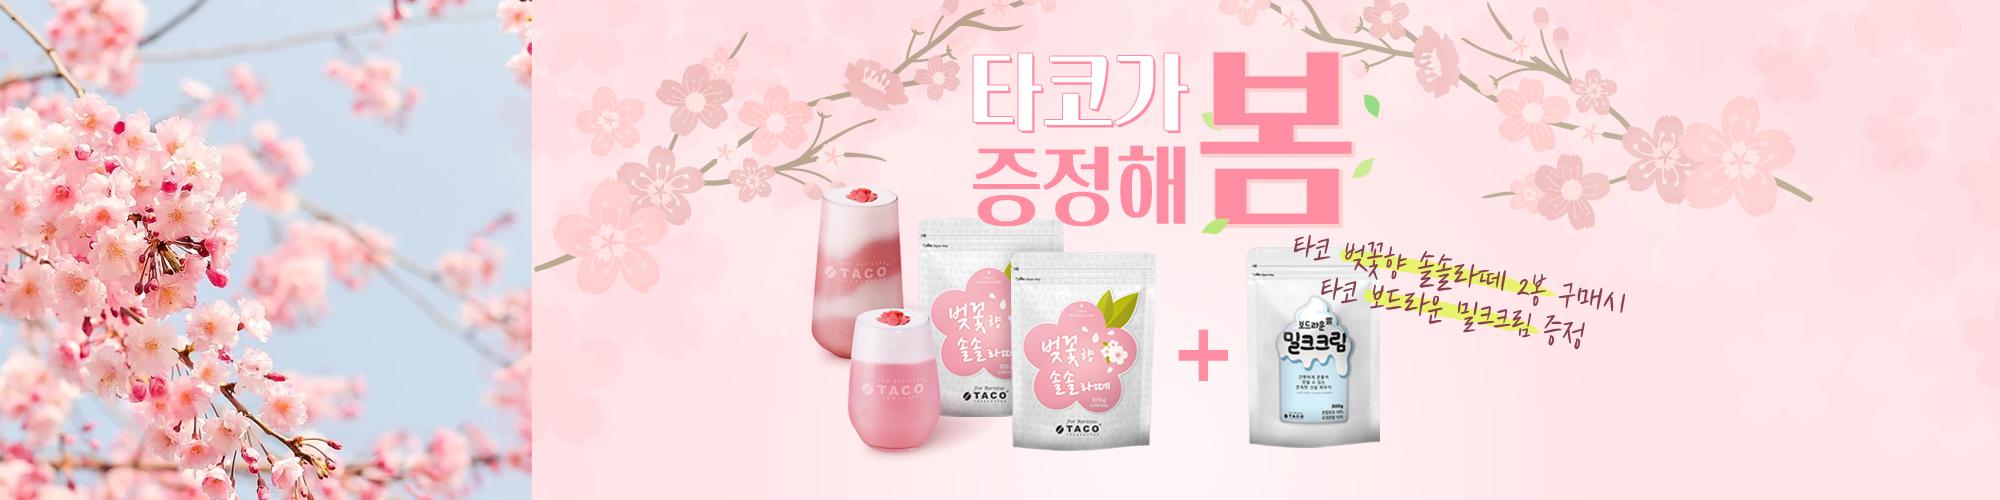 CherryBlossom_gift_2000